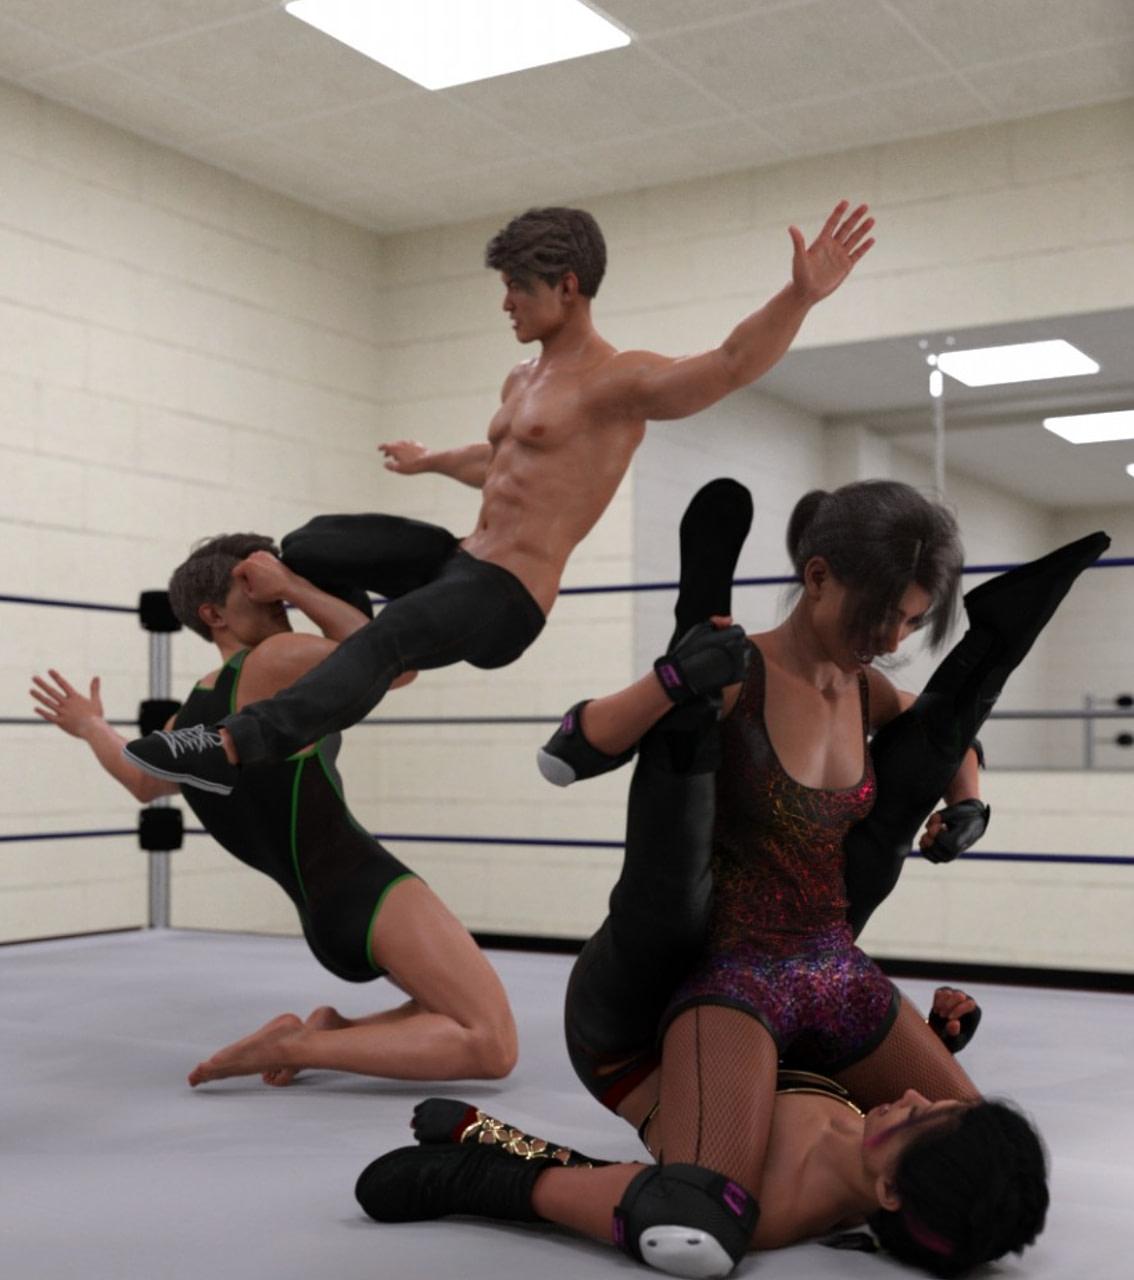 daz wrestling poses gen 88